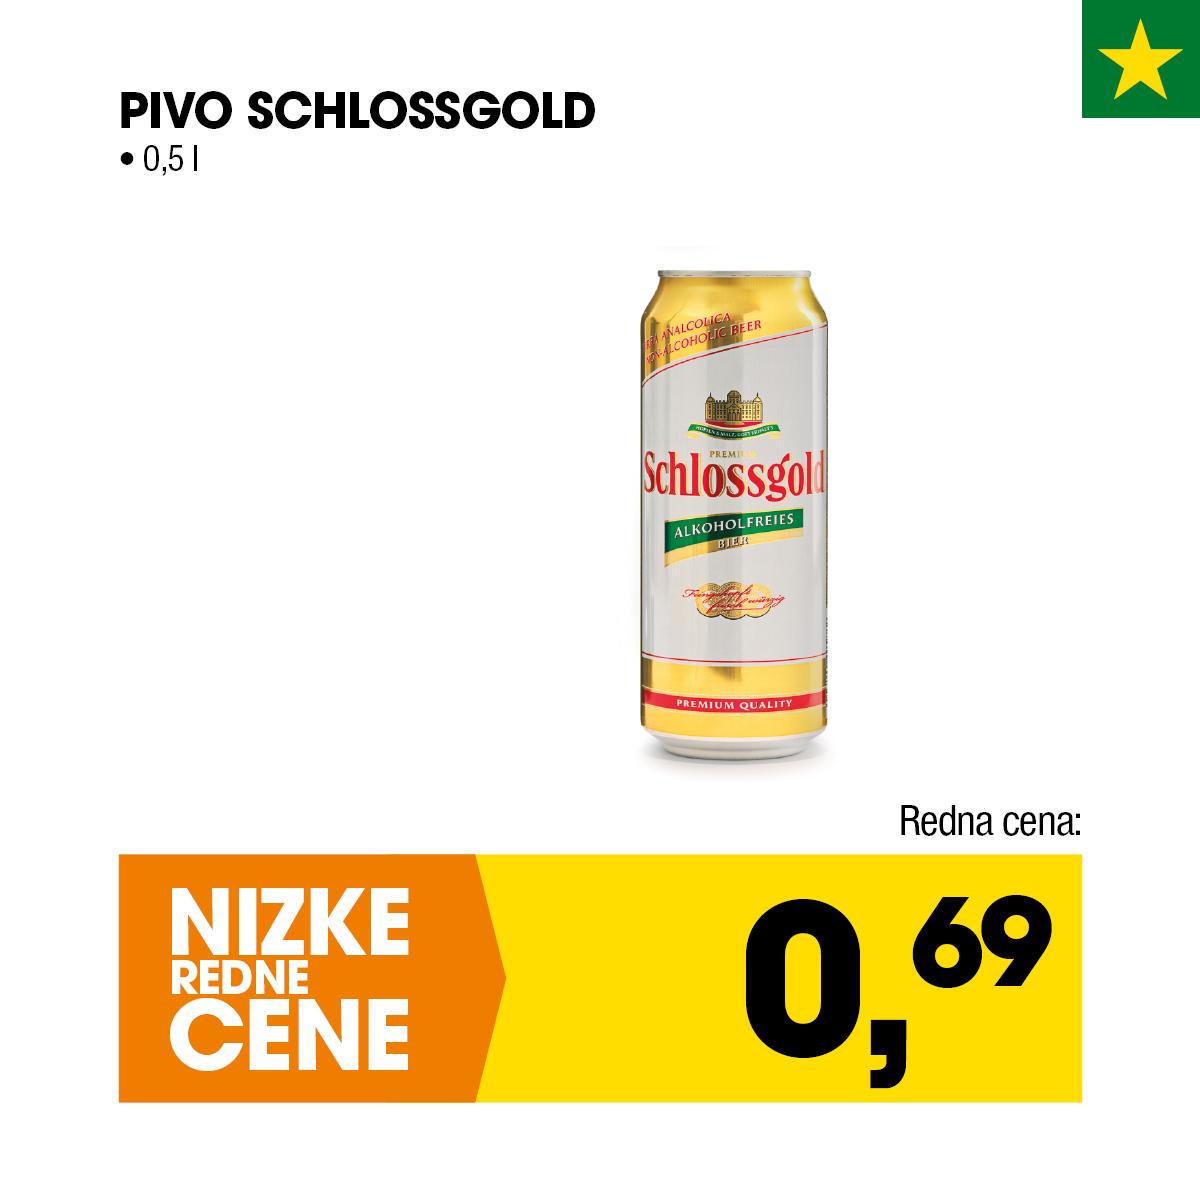 Nizke cene - Pivo Schlossgold